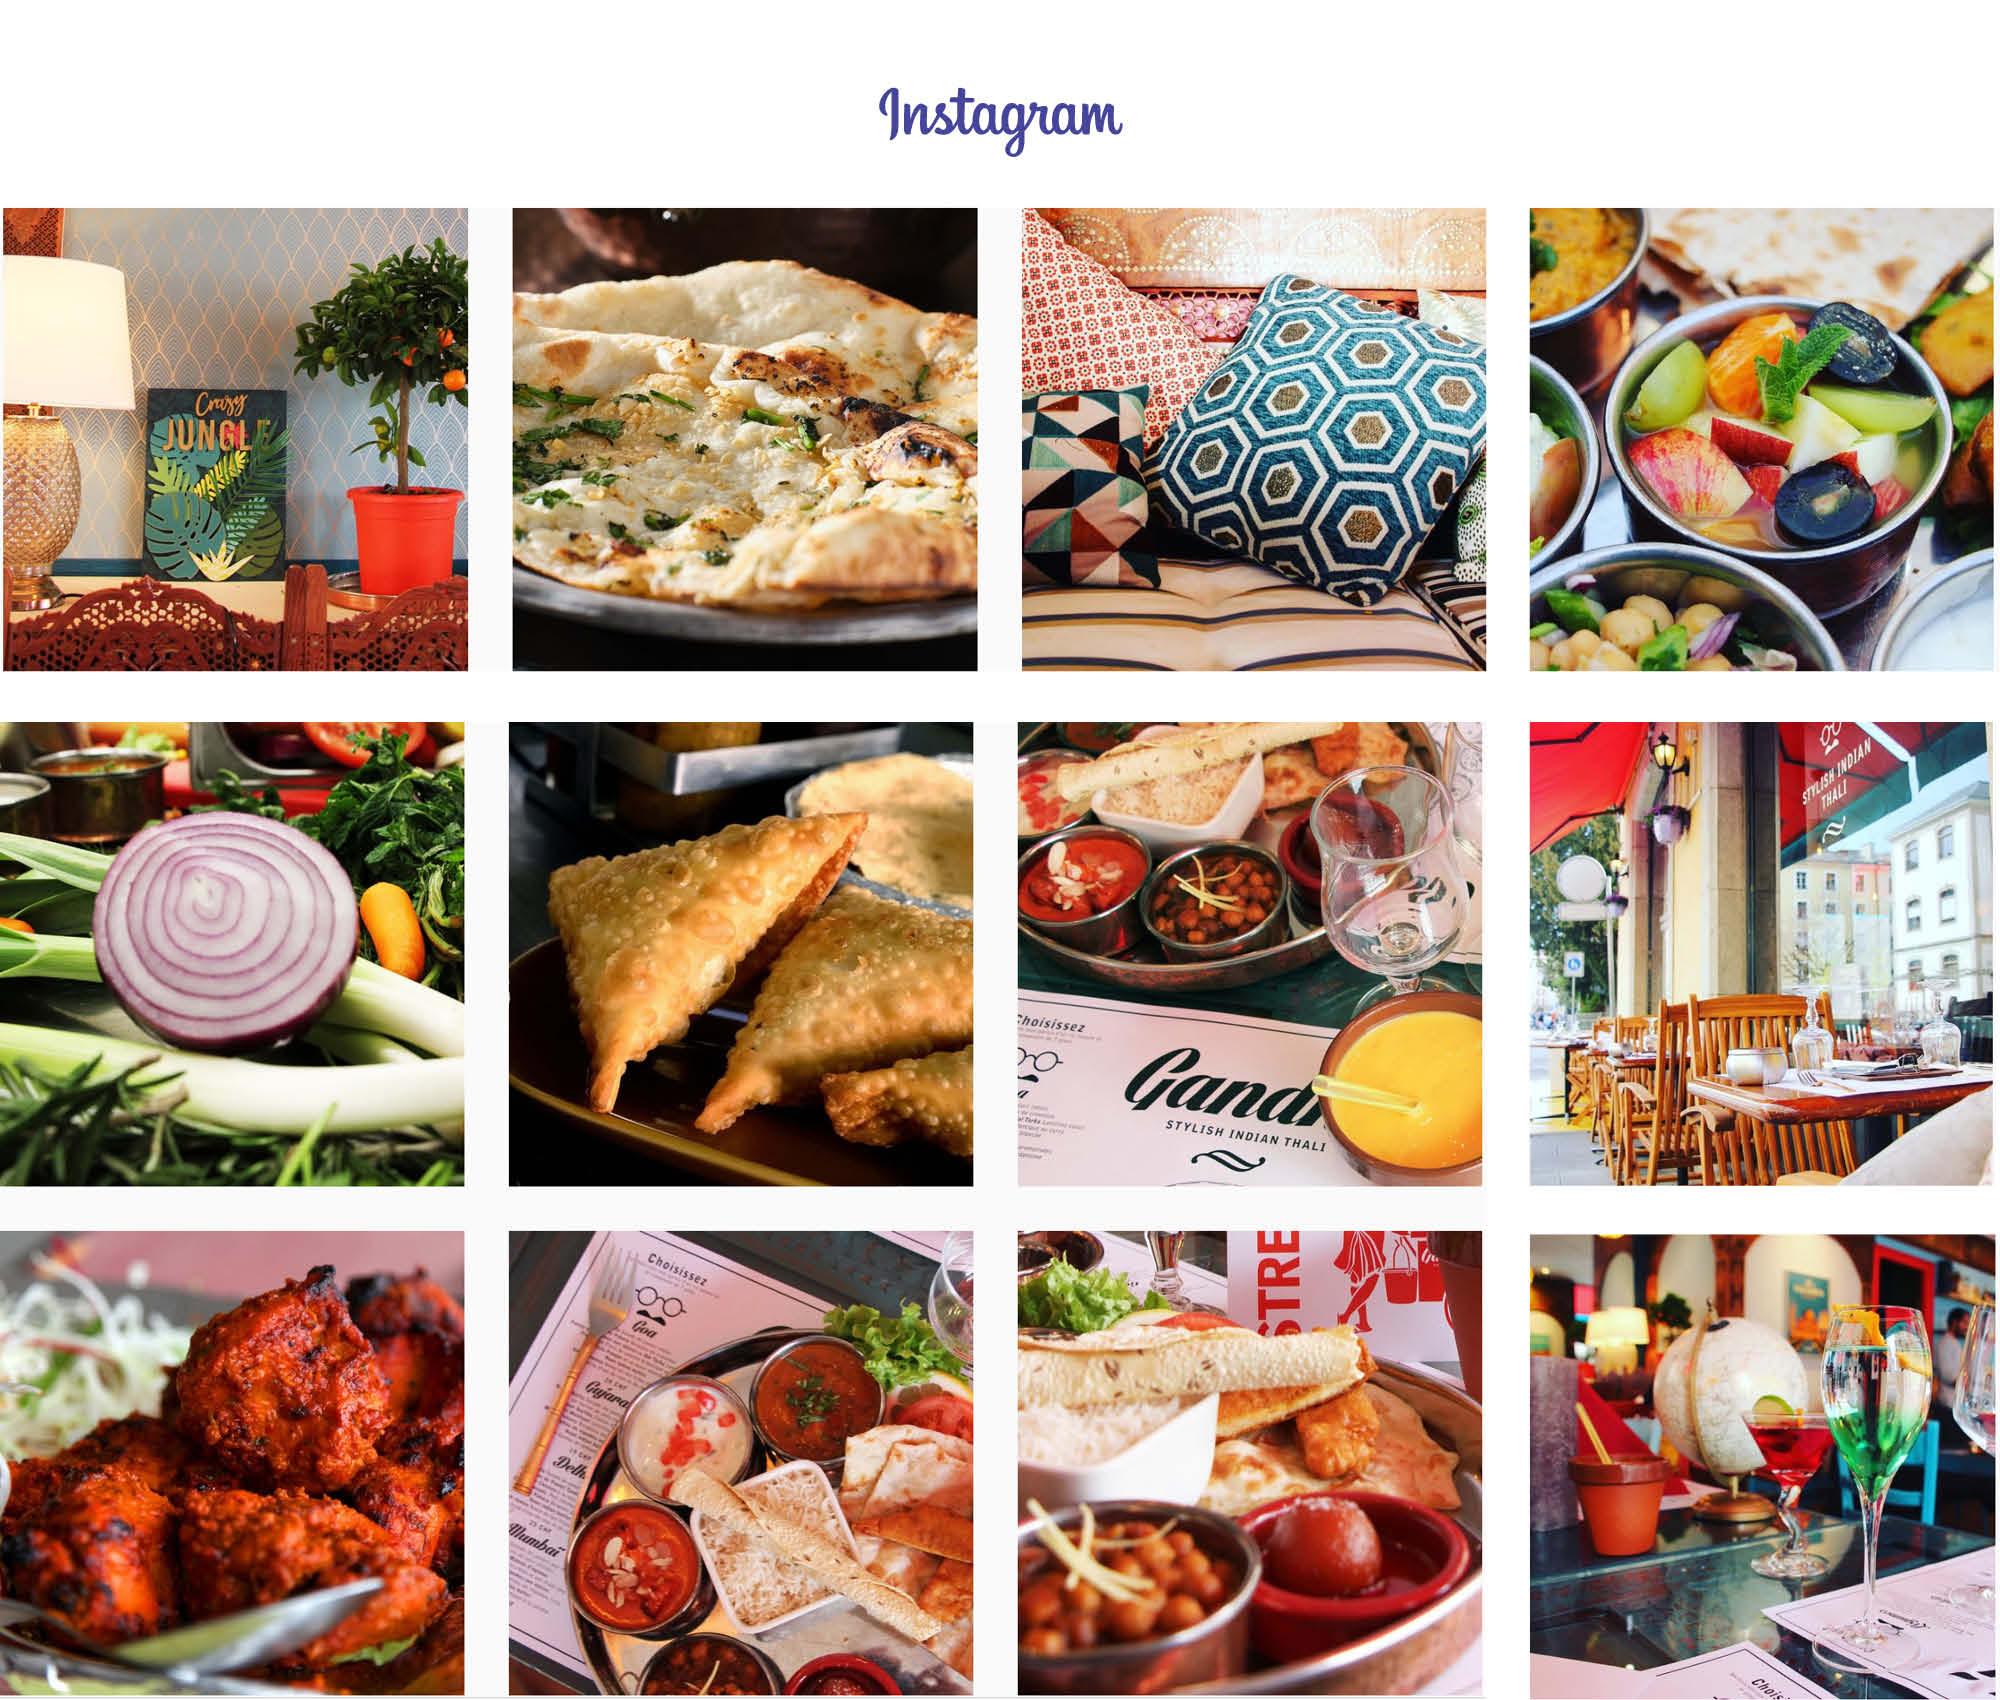 Posts Instagram restaurant Geneve Café Gandhi